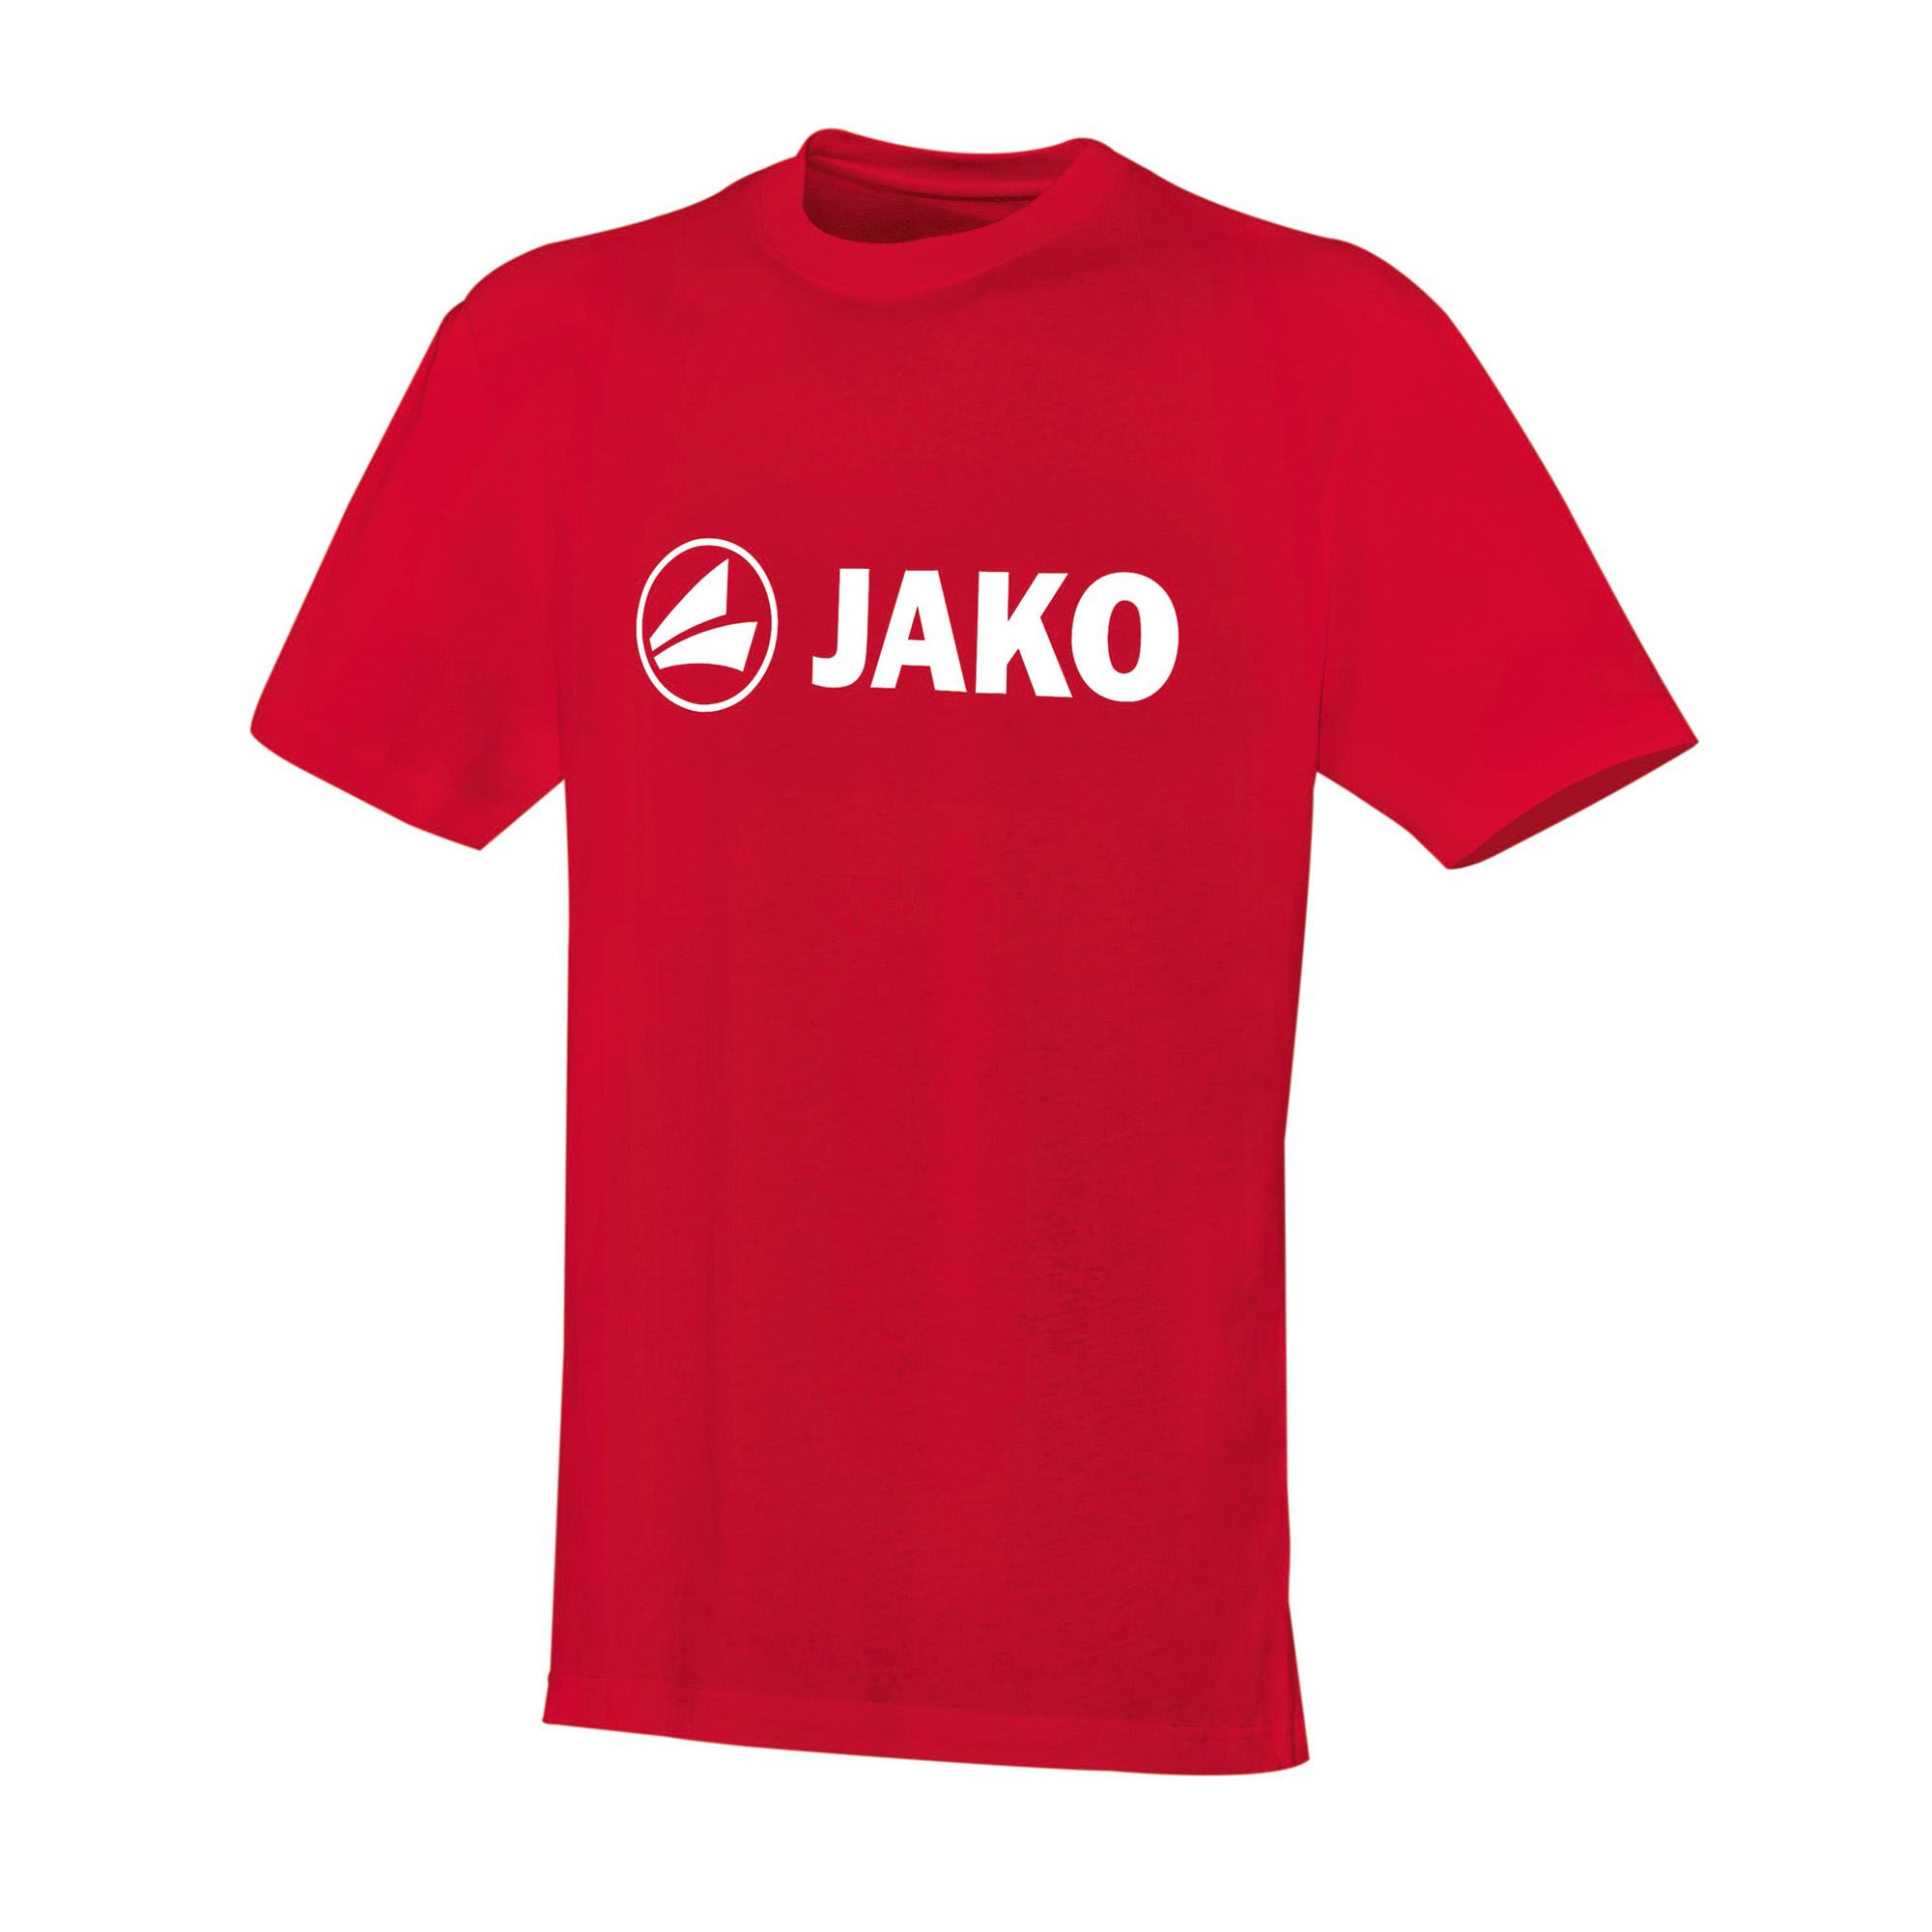 Jako Kinder T-Shirt Promo 6163-01 164